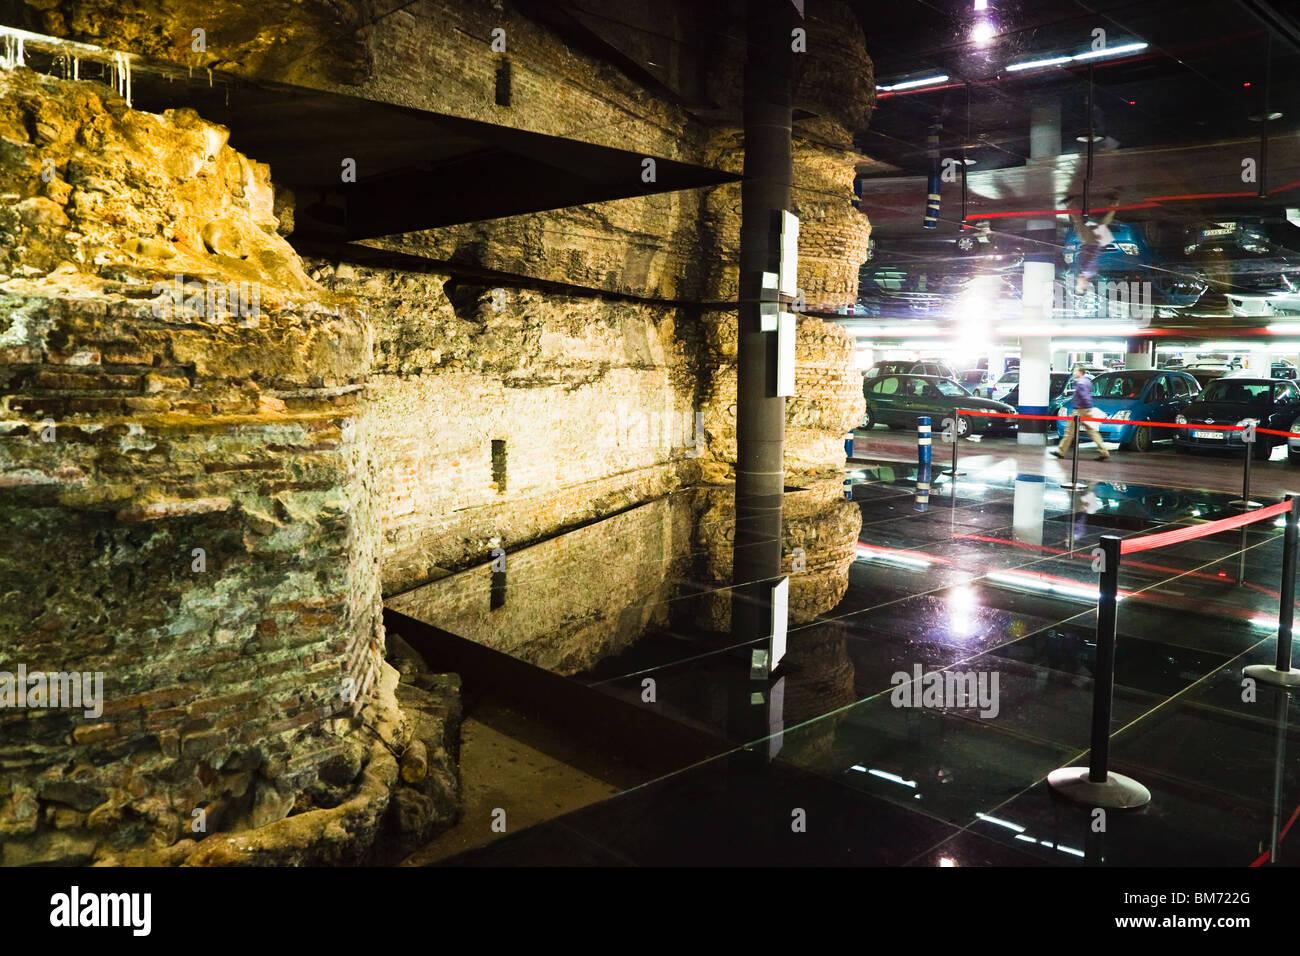 Malaga, Malaga Province, Costa del Sol, Spain. Ancient city walls in parking garage beneath Plaza de la Marina - Stock Image